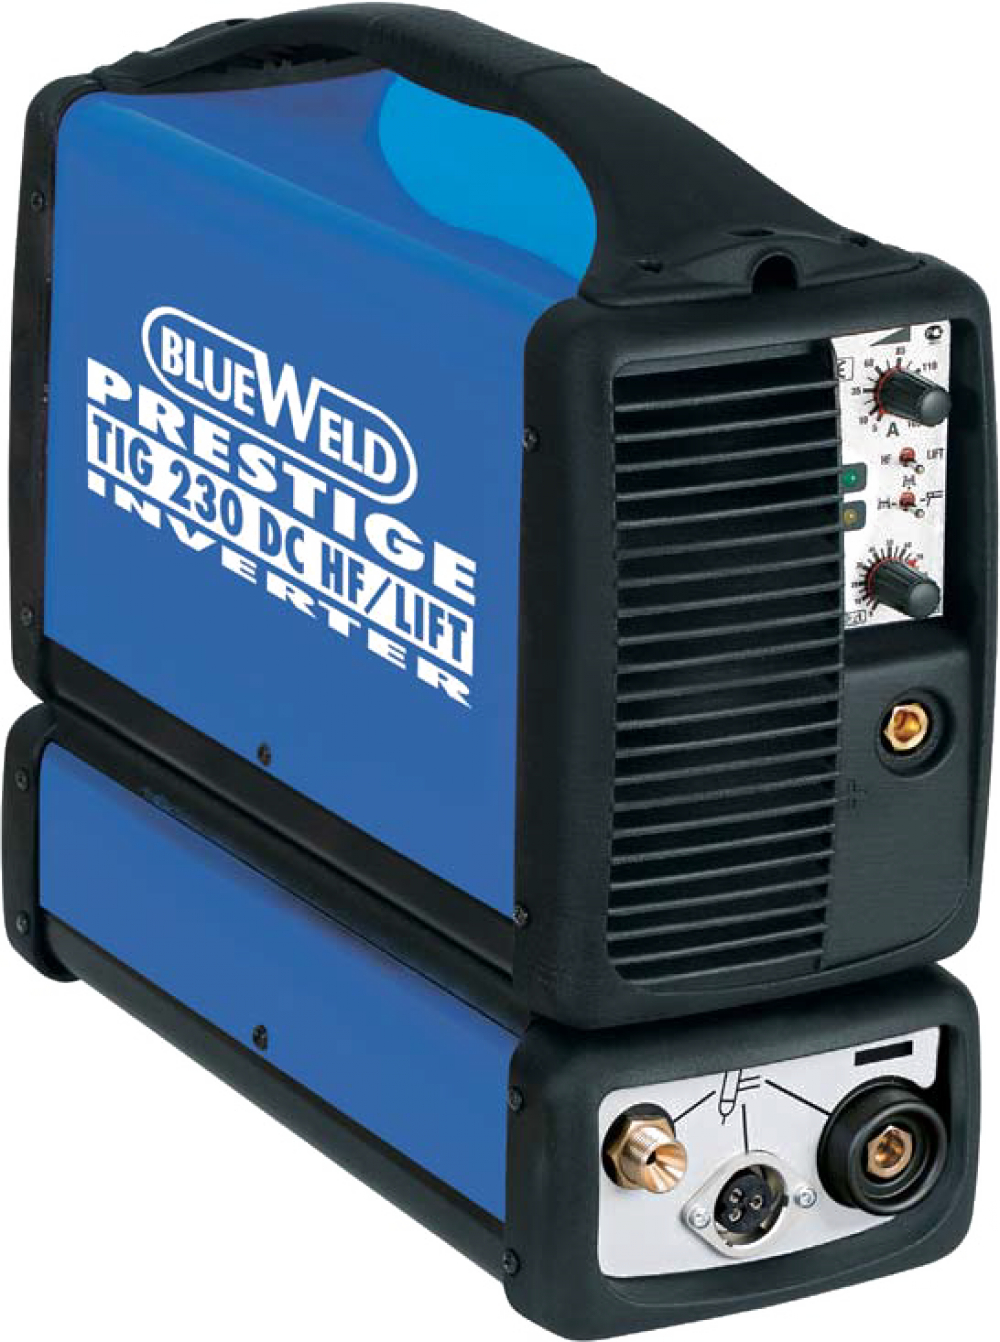 Сварочный аппарат Blue weld Prestige tig 230 dc hf/lift